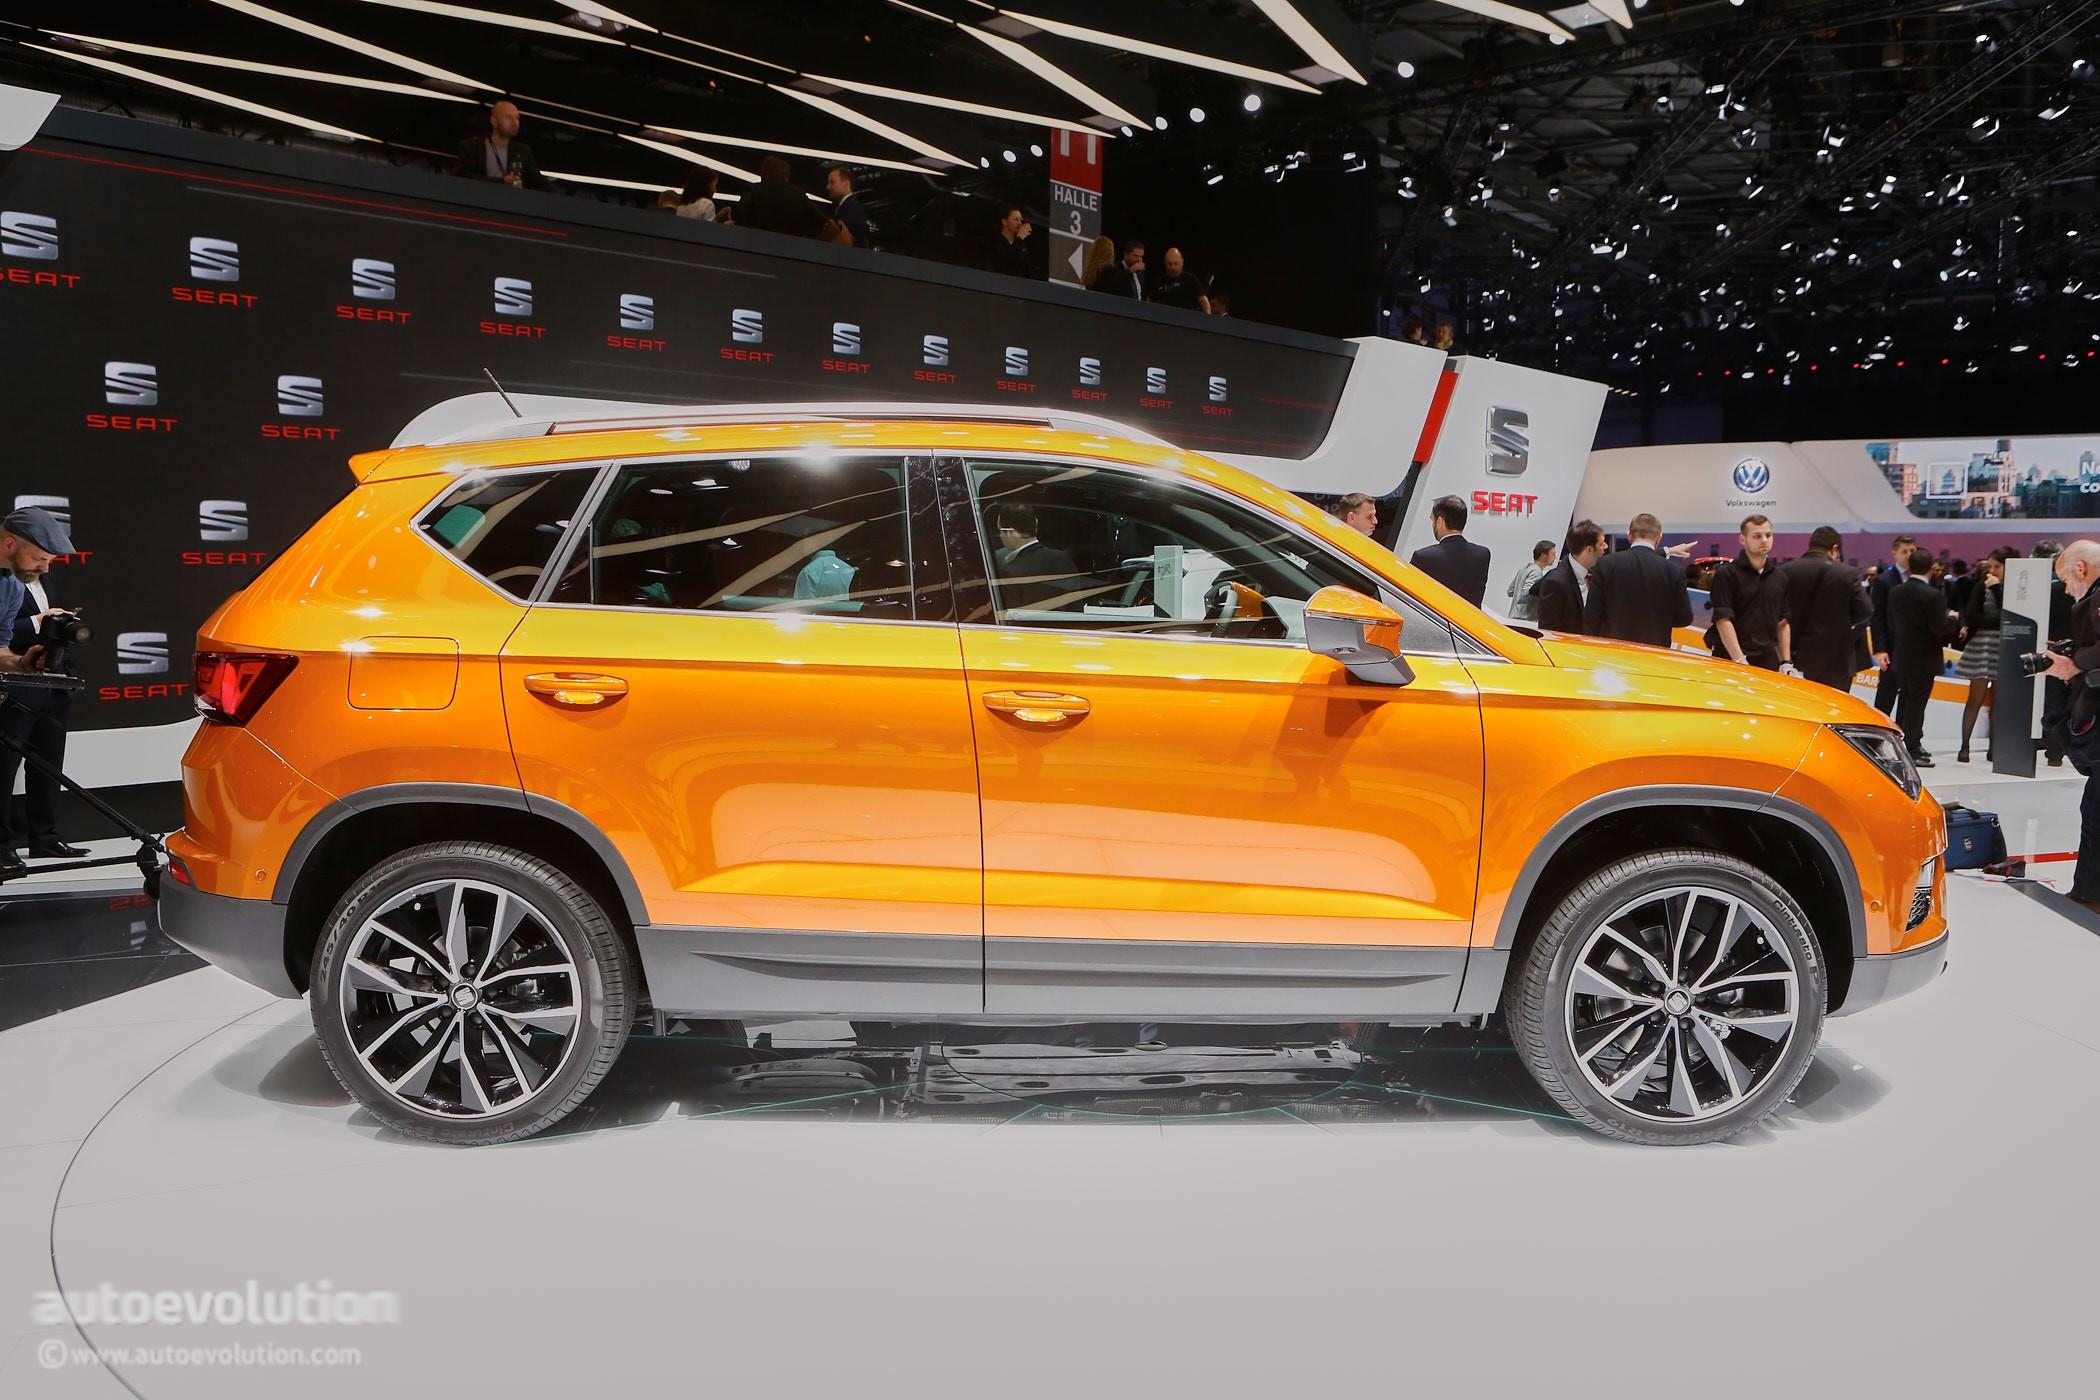 2016 SEAT Ateca SUV Makes Official Debut at Geneva - autoevolution